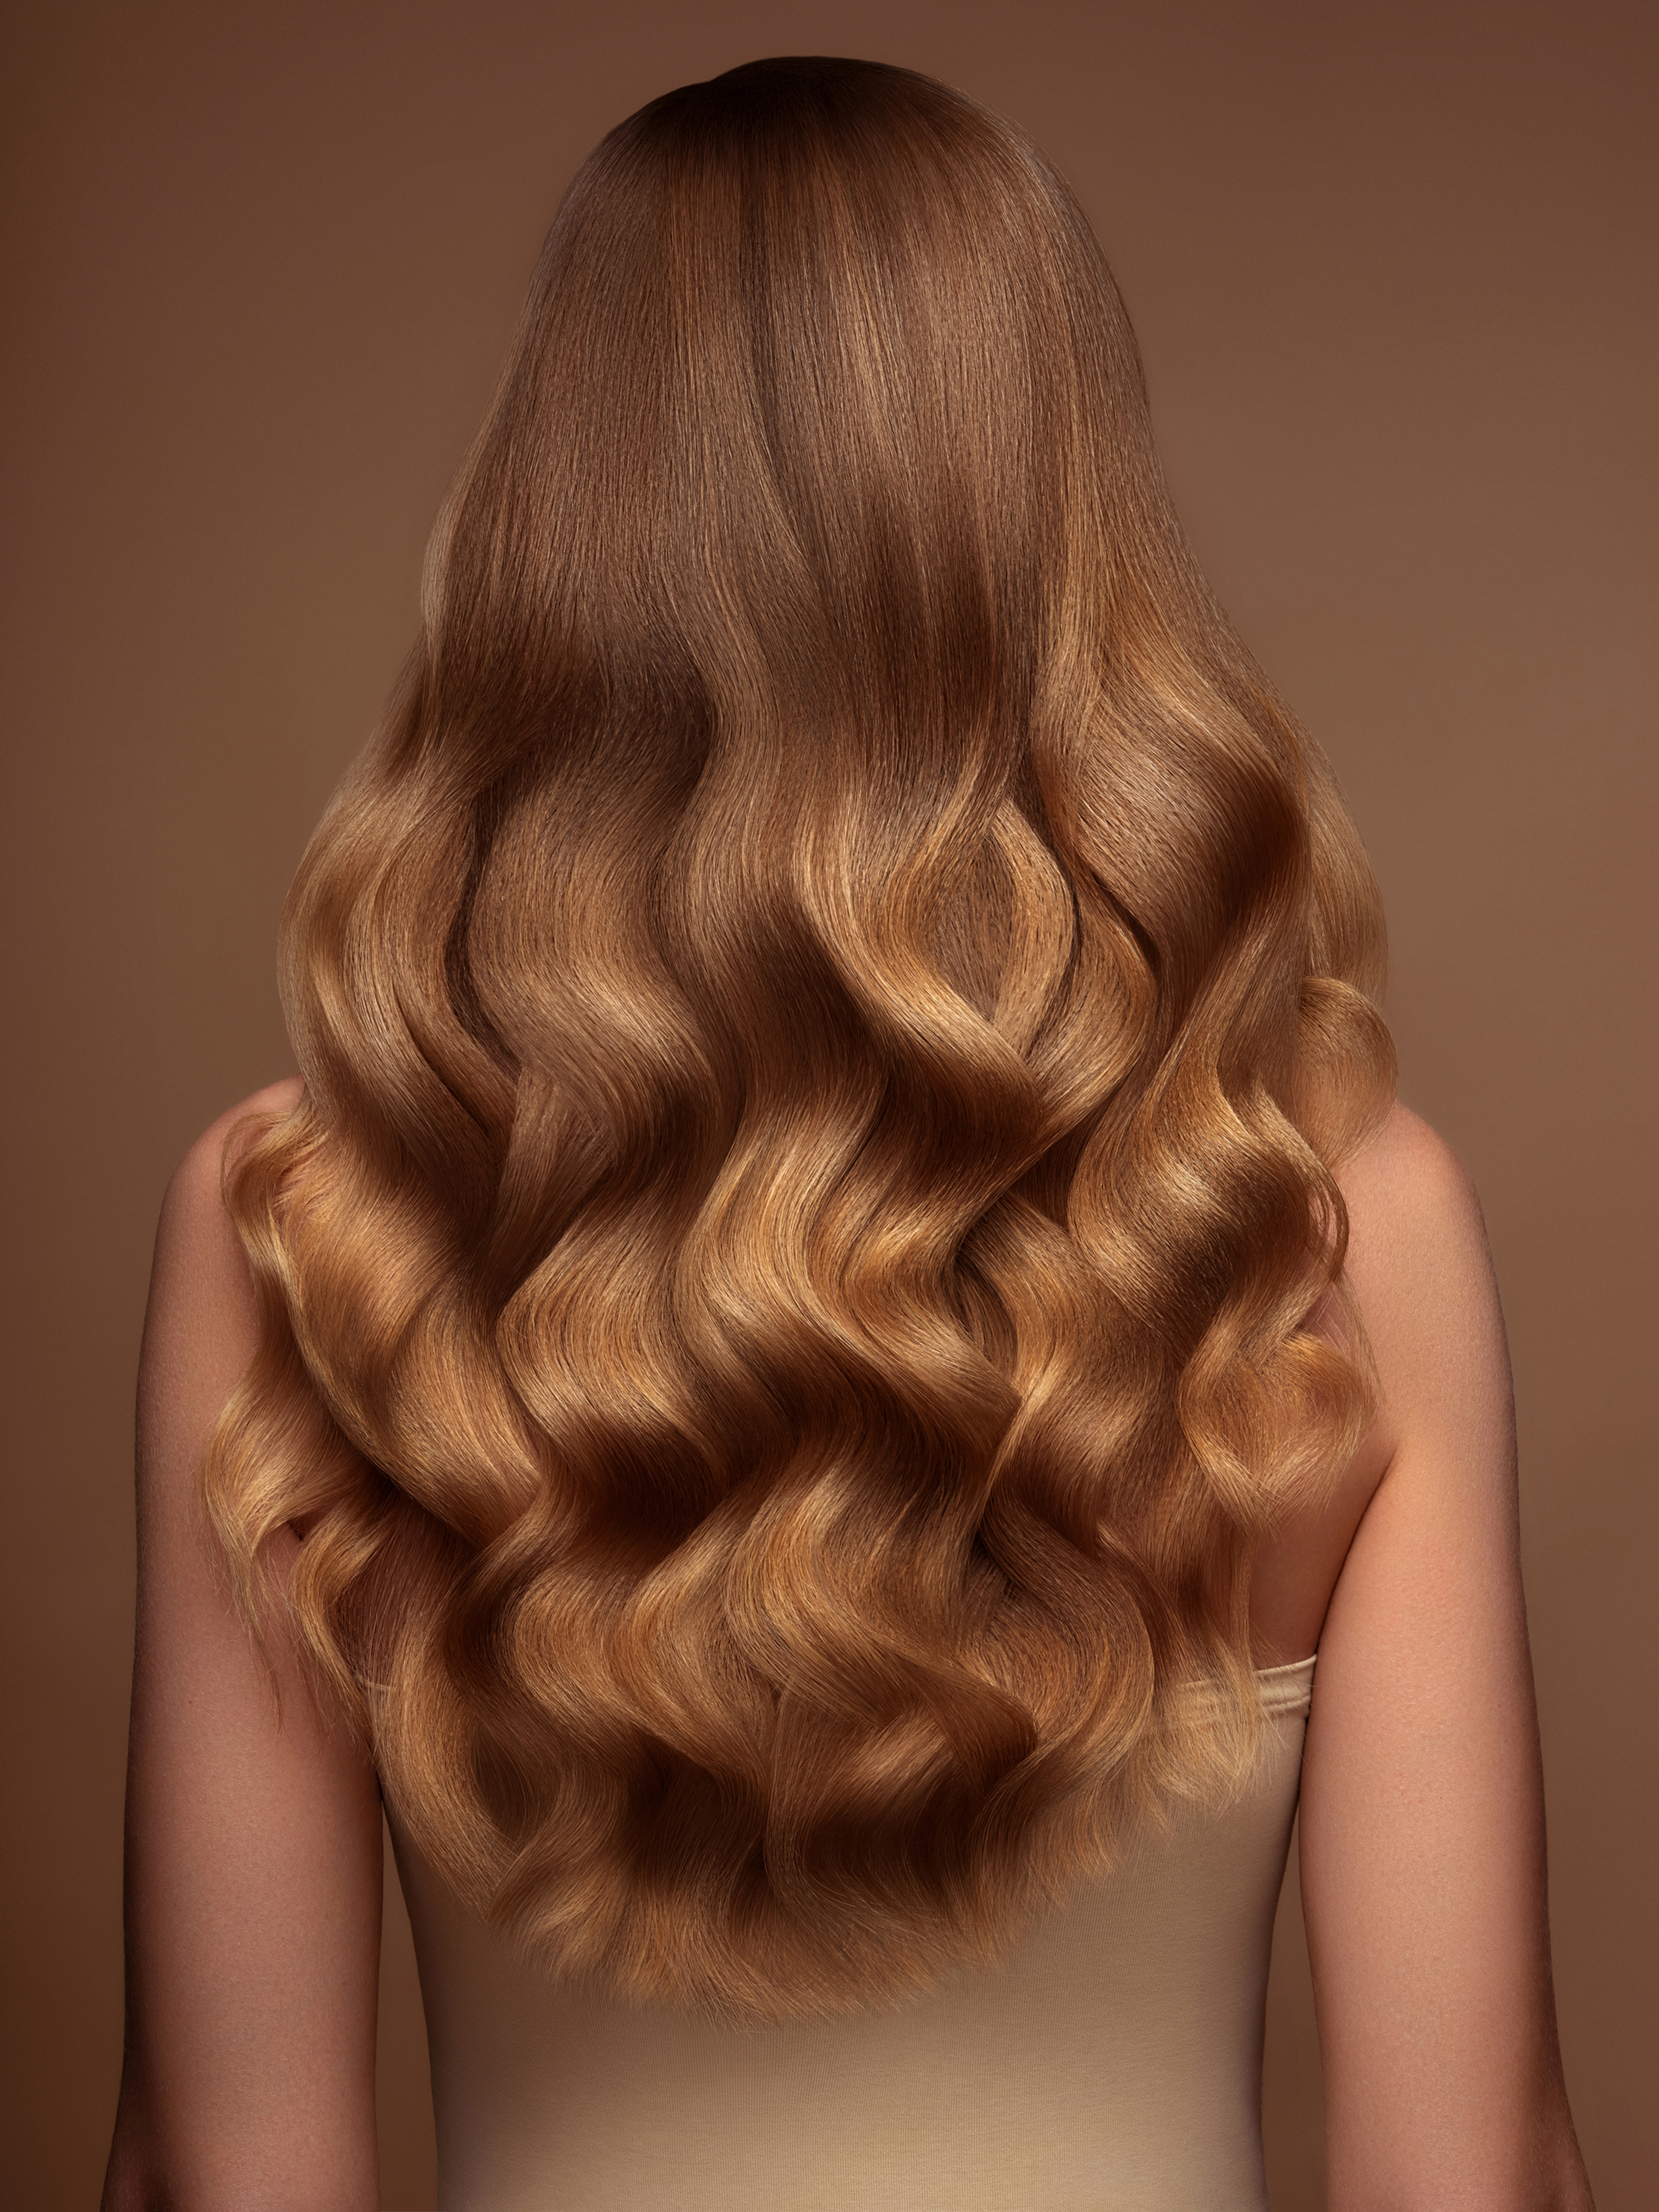 Hair Perm & Straight